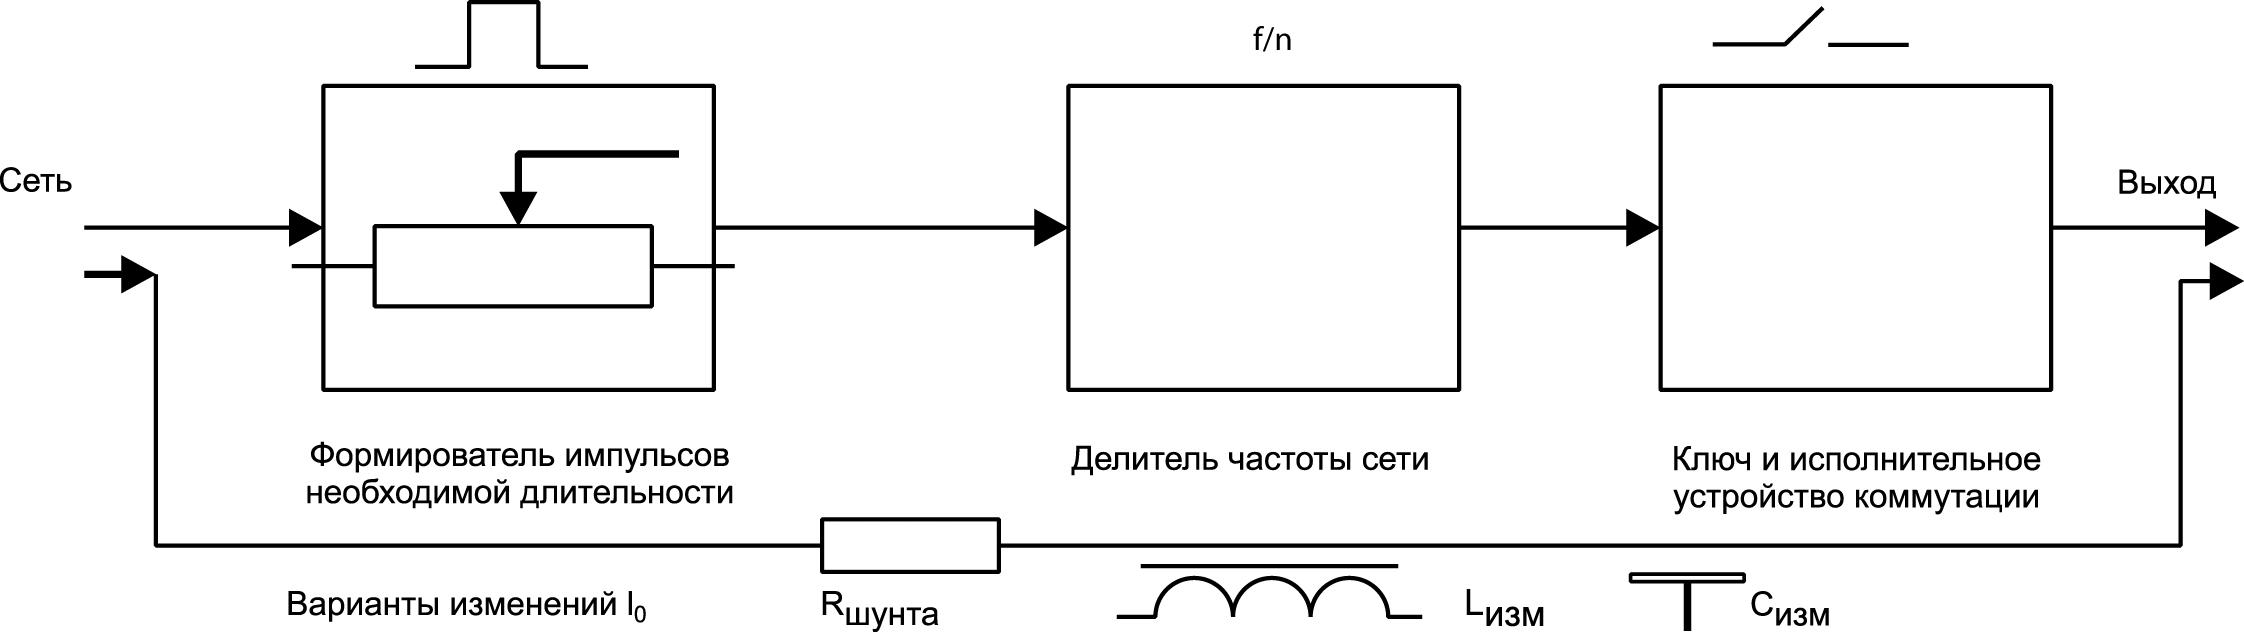 Блок-схема регулятора фазы переходного процесса